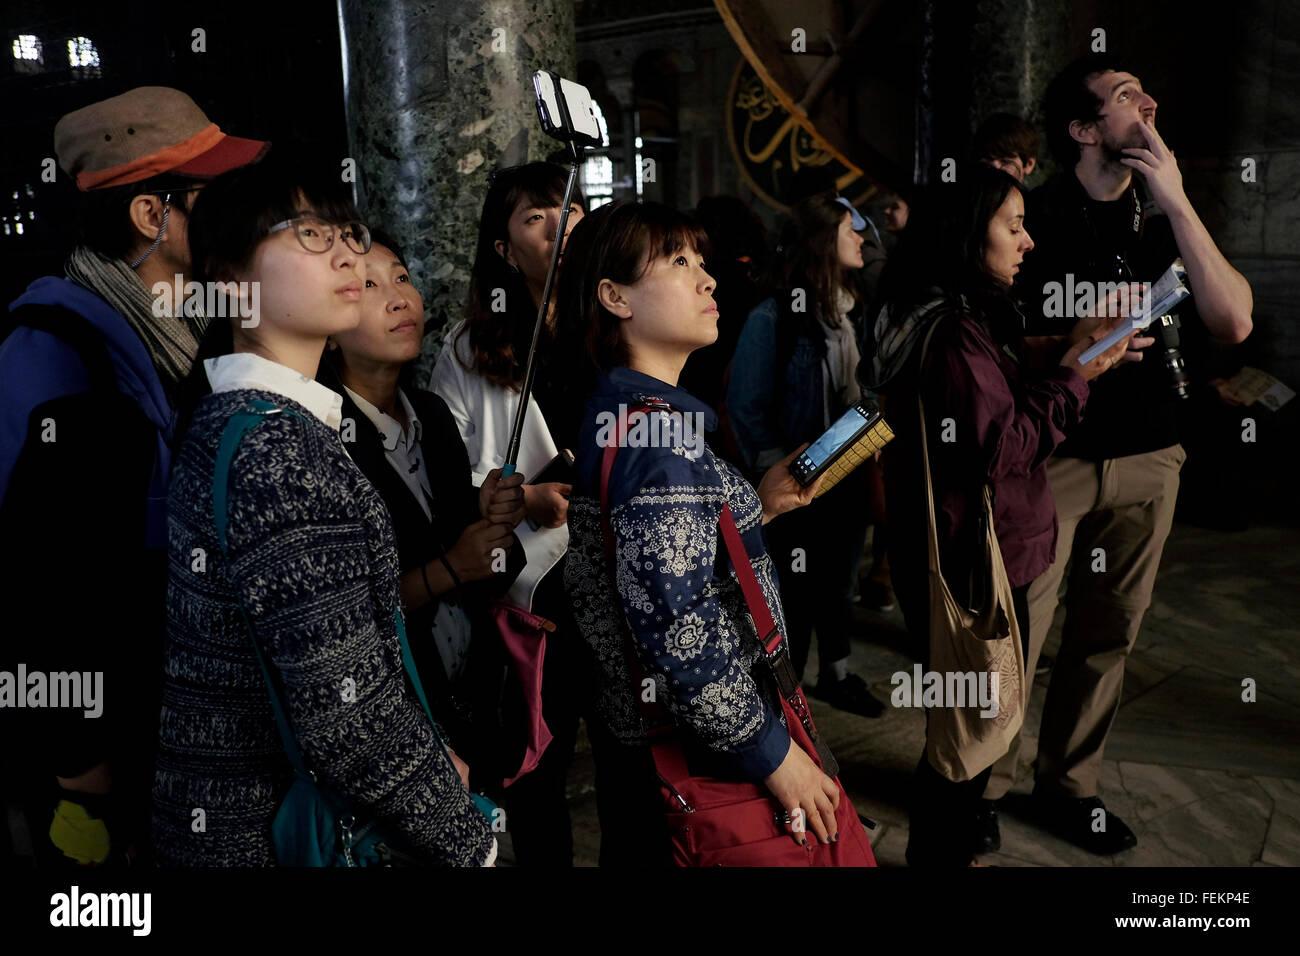 Südkoreanische Touristen in der Hagia Sophia, Istanbul, Türkei am 3. Mai 2015. Stockbild